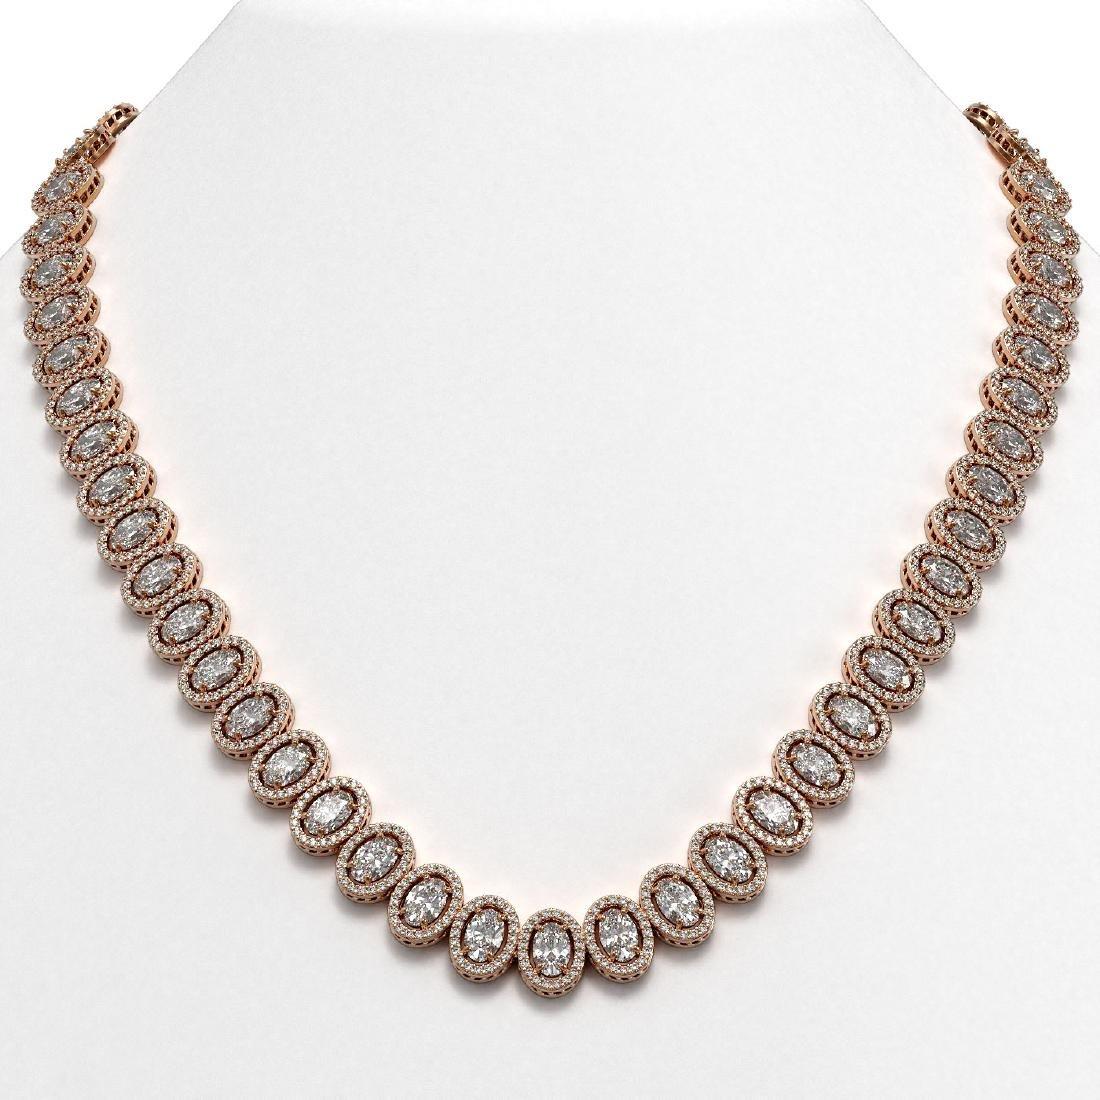 42.56 CTW Oval Diamond Designer Necklace 18K Rose Gold